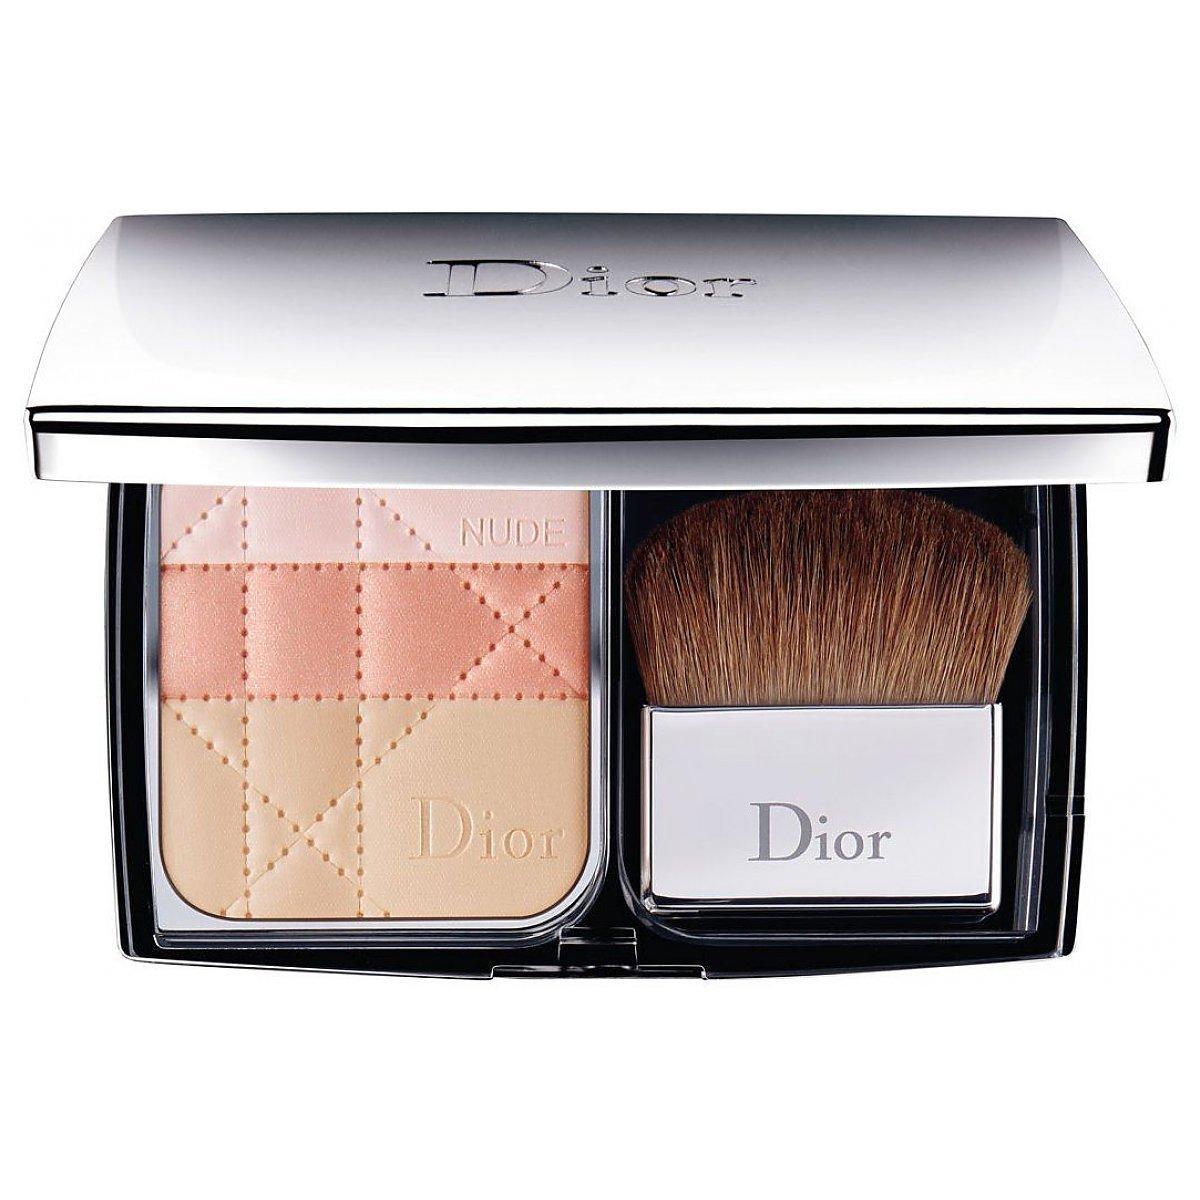 Christian Dior Diorskin Nude Natural Glow Sculpting Powder